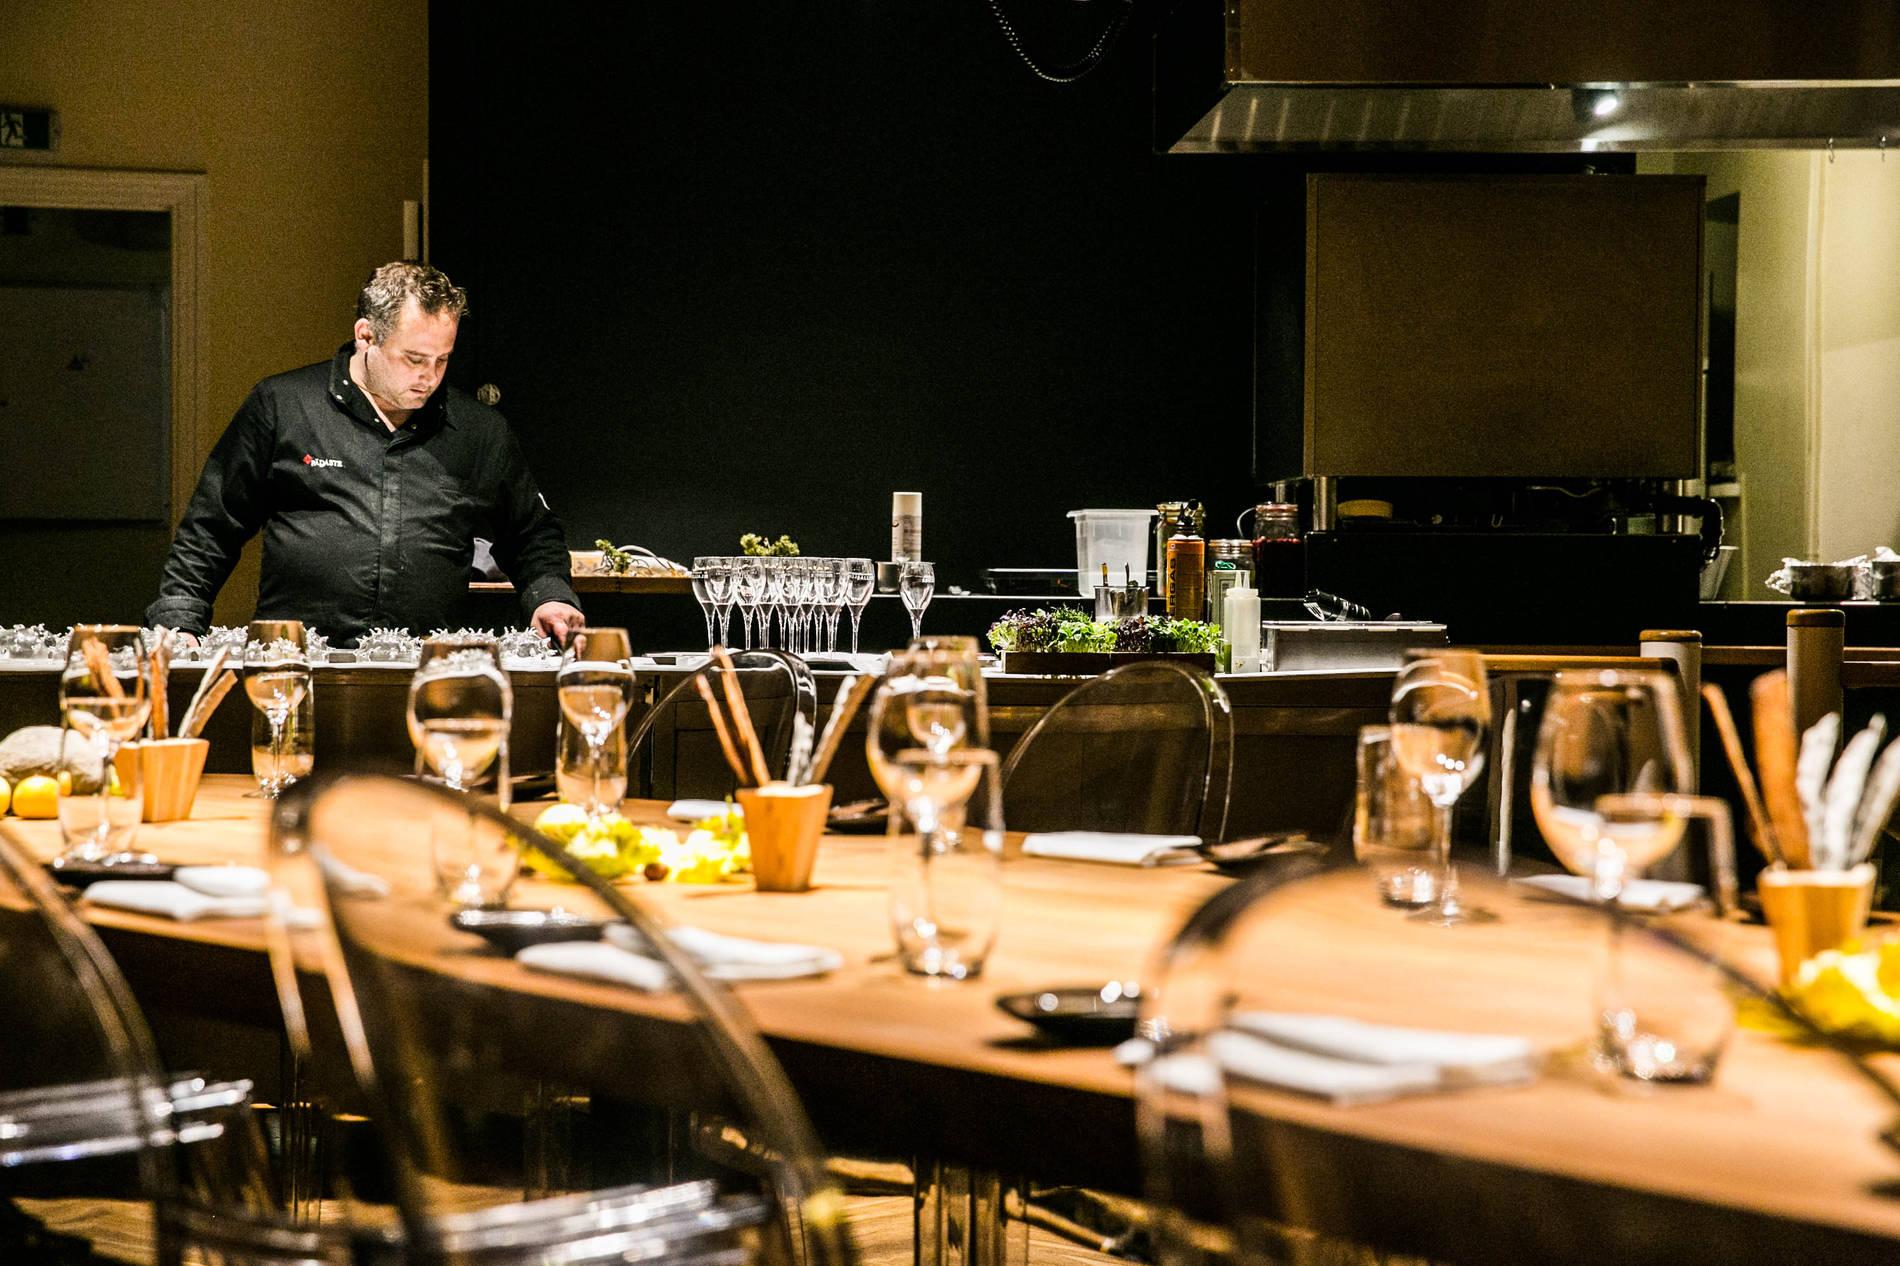 Internal view of the Alexander Chef's Table restaurant in Tallinn, Estonia